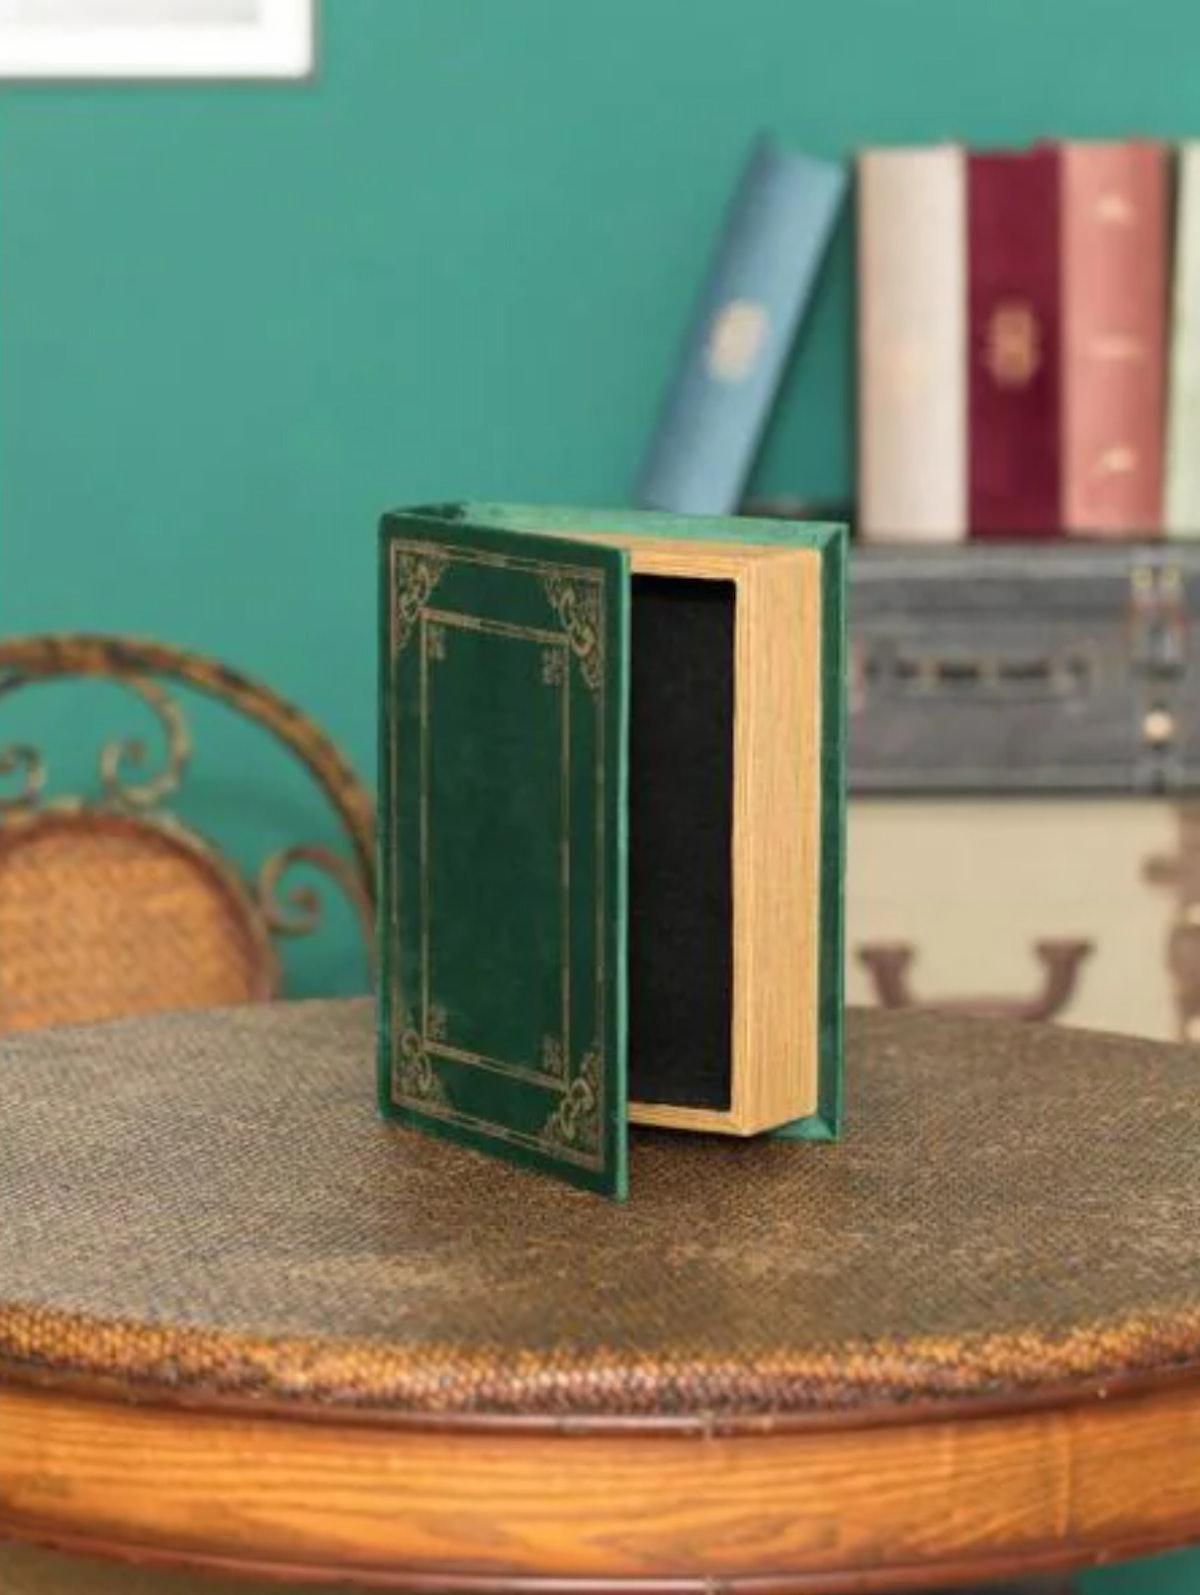 Wooden Vintage Book-Shaped Trinket Storage Box